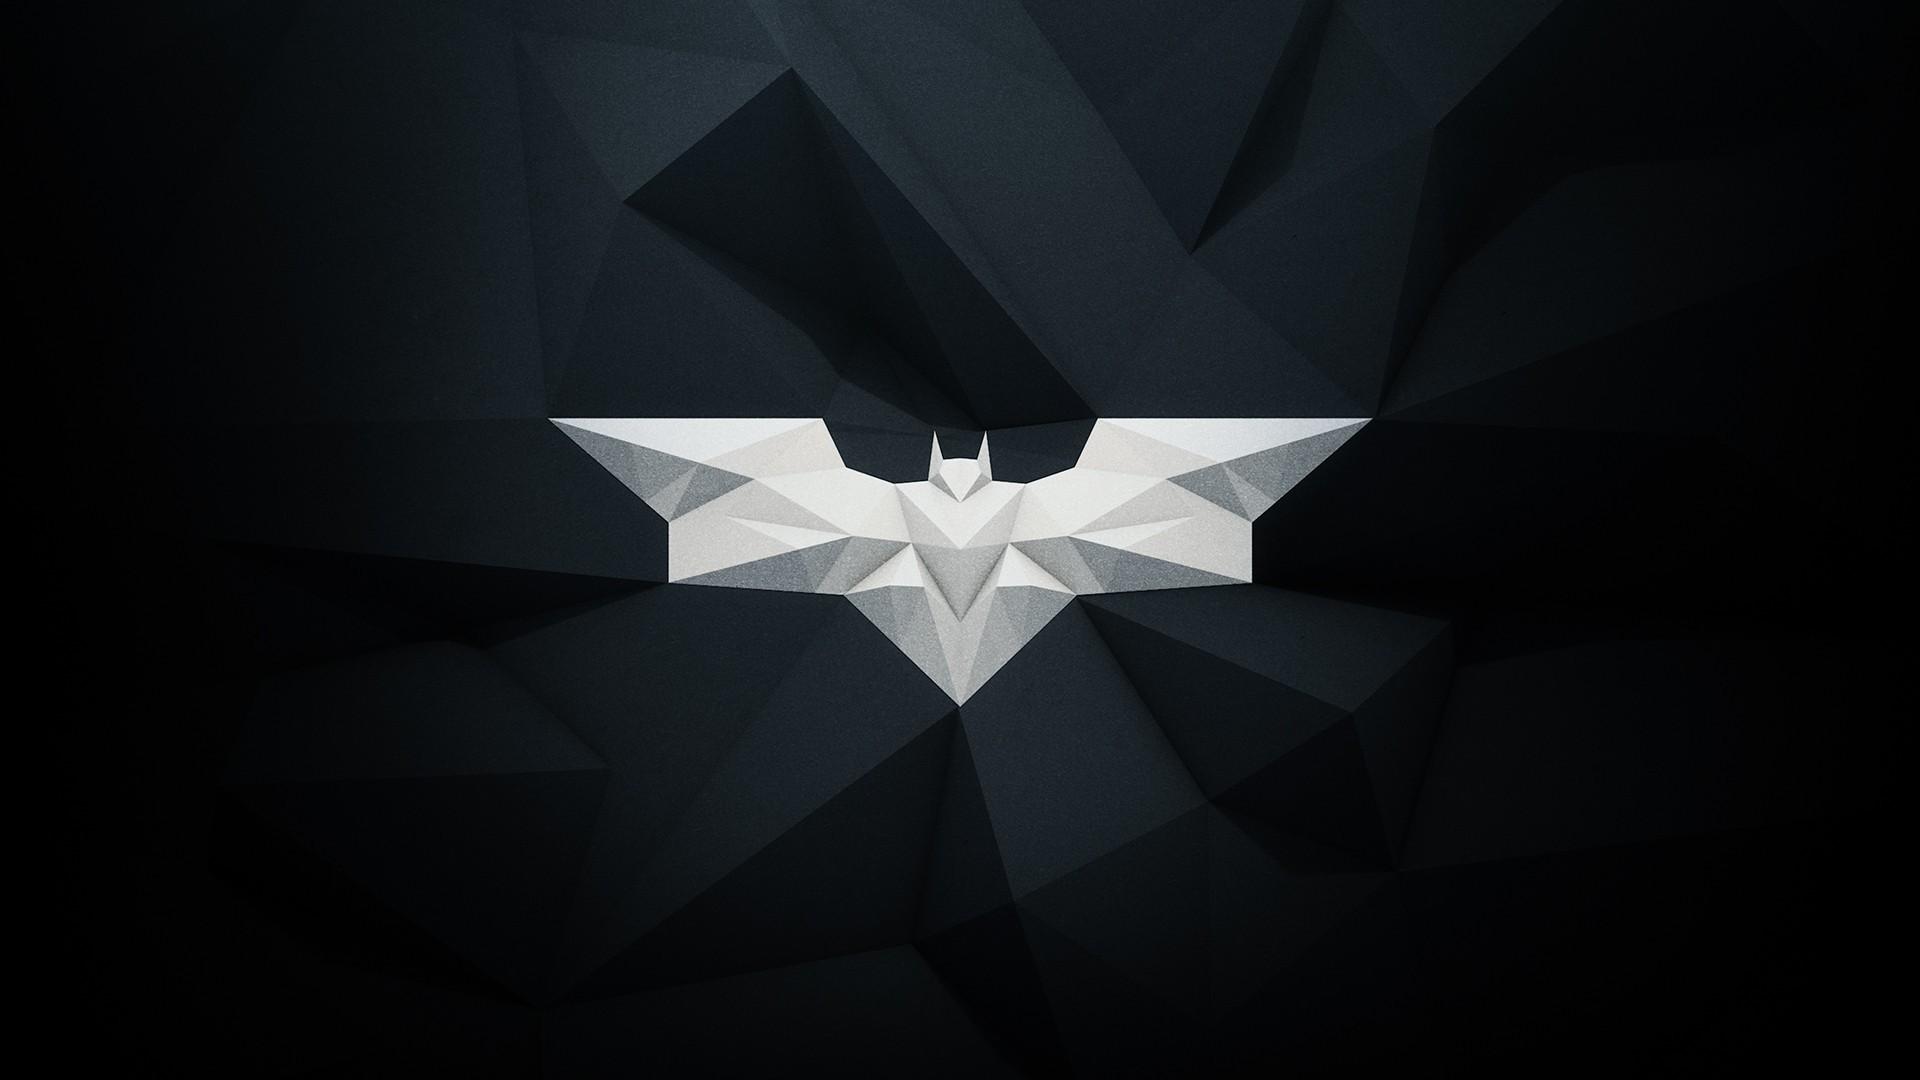 batman logo graphic design hd artist 4k wallpapers